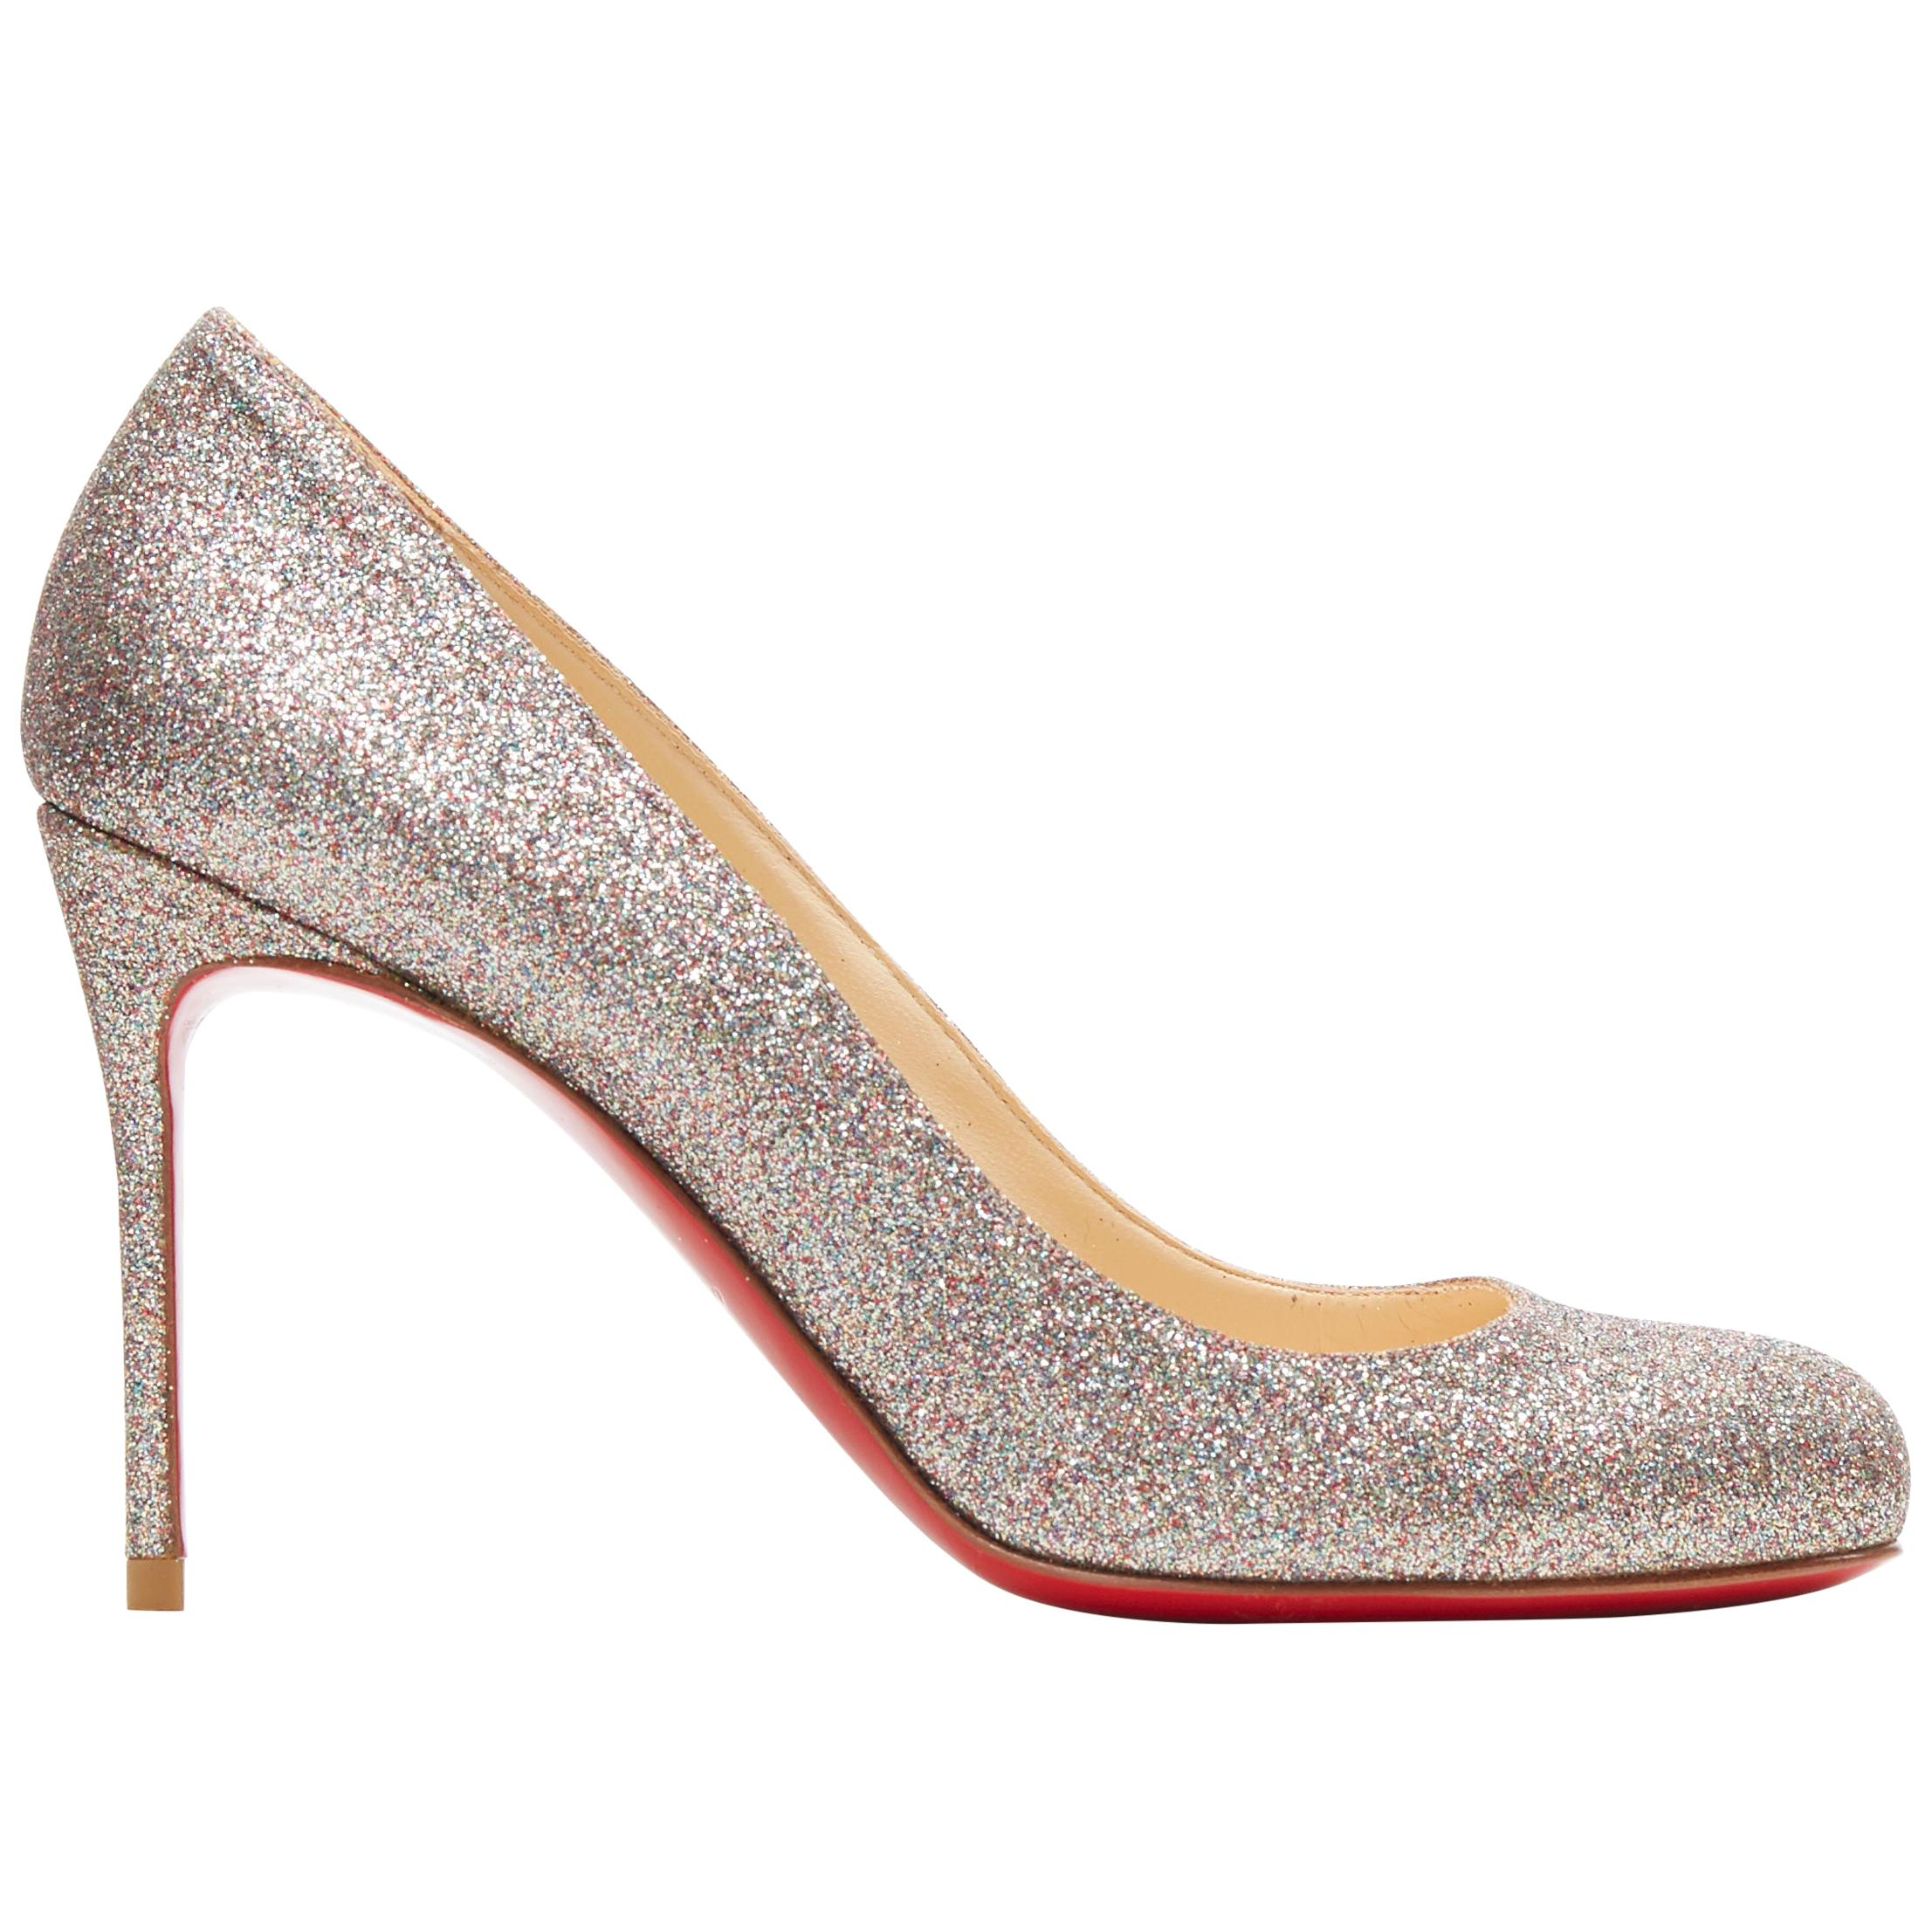 CHRISTIAN LOUBOUTIN Fifi 85 silver fine glitter round toe slim heel pump EU37